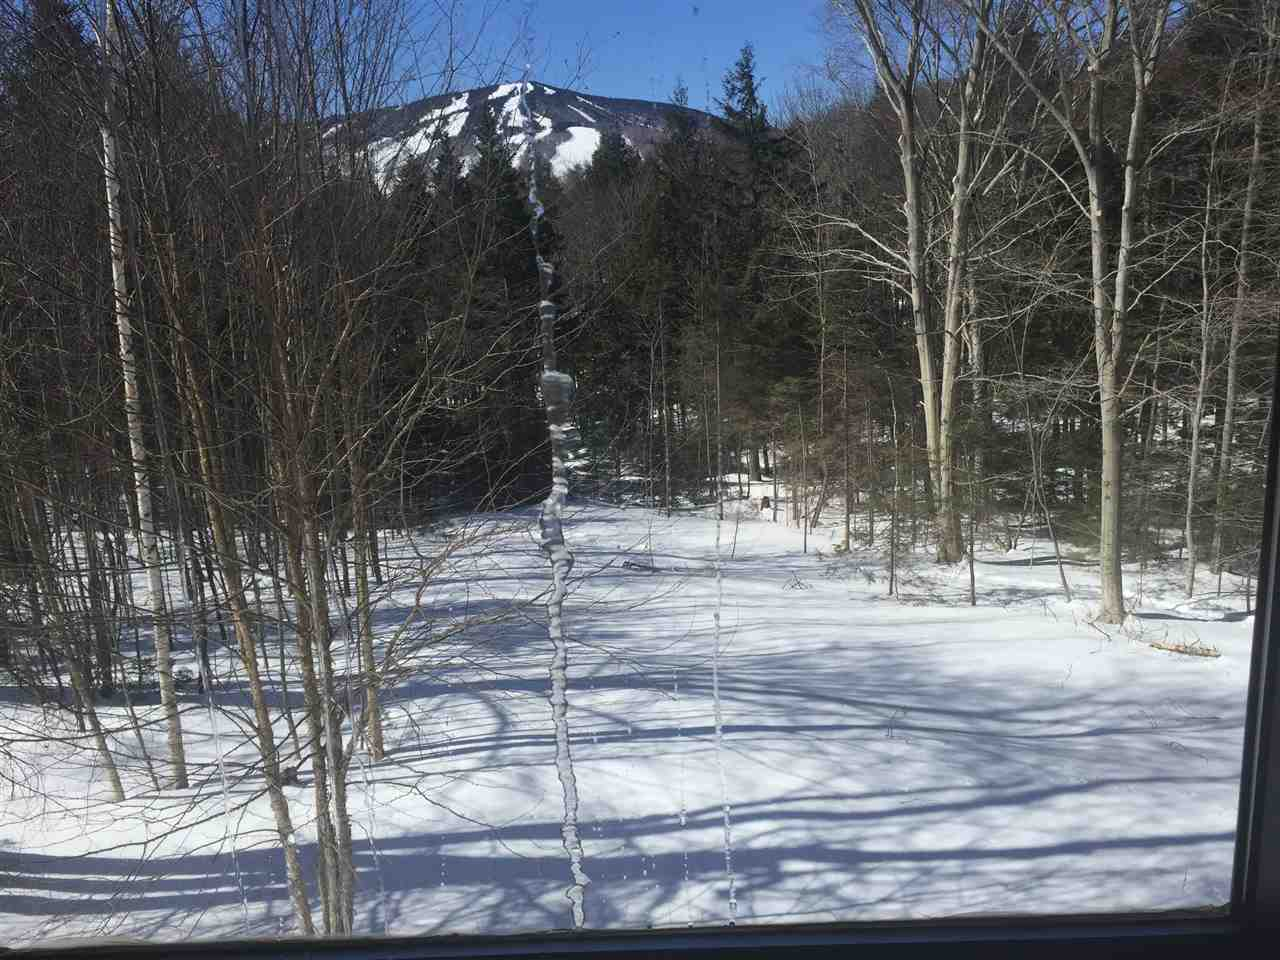 Mount-Snow-Real-Estate-4624619-11